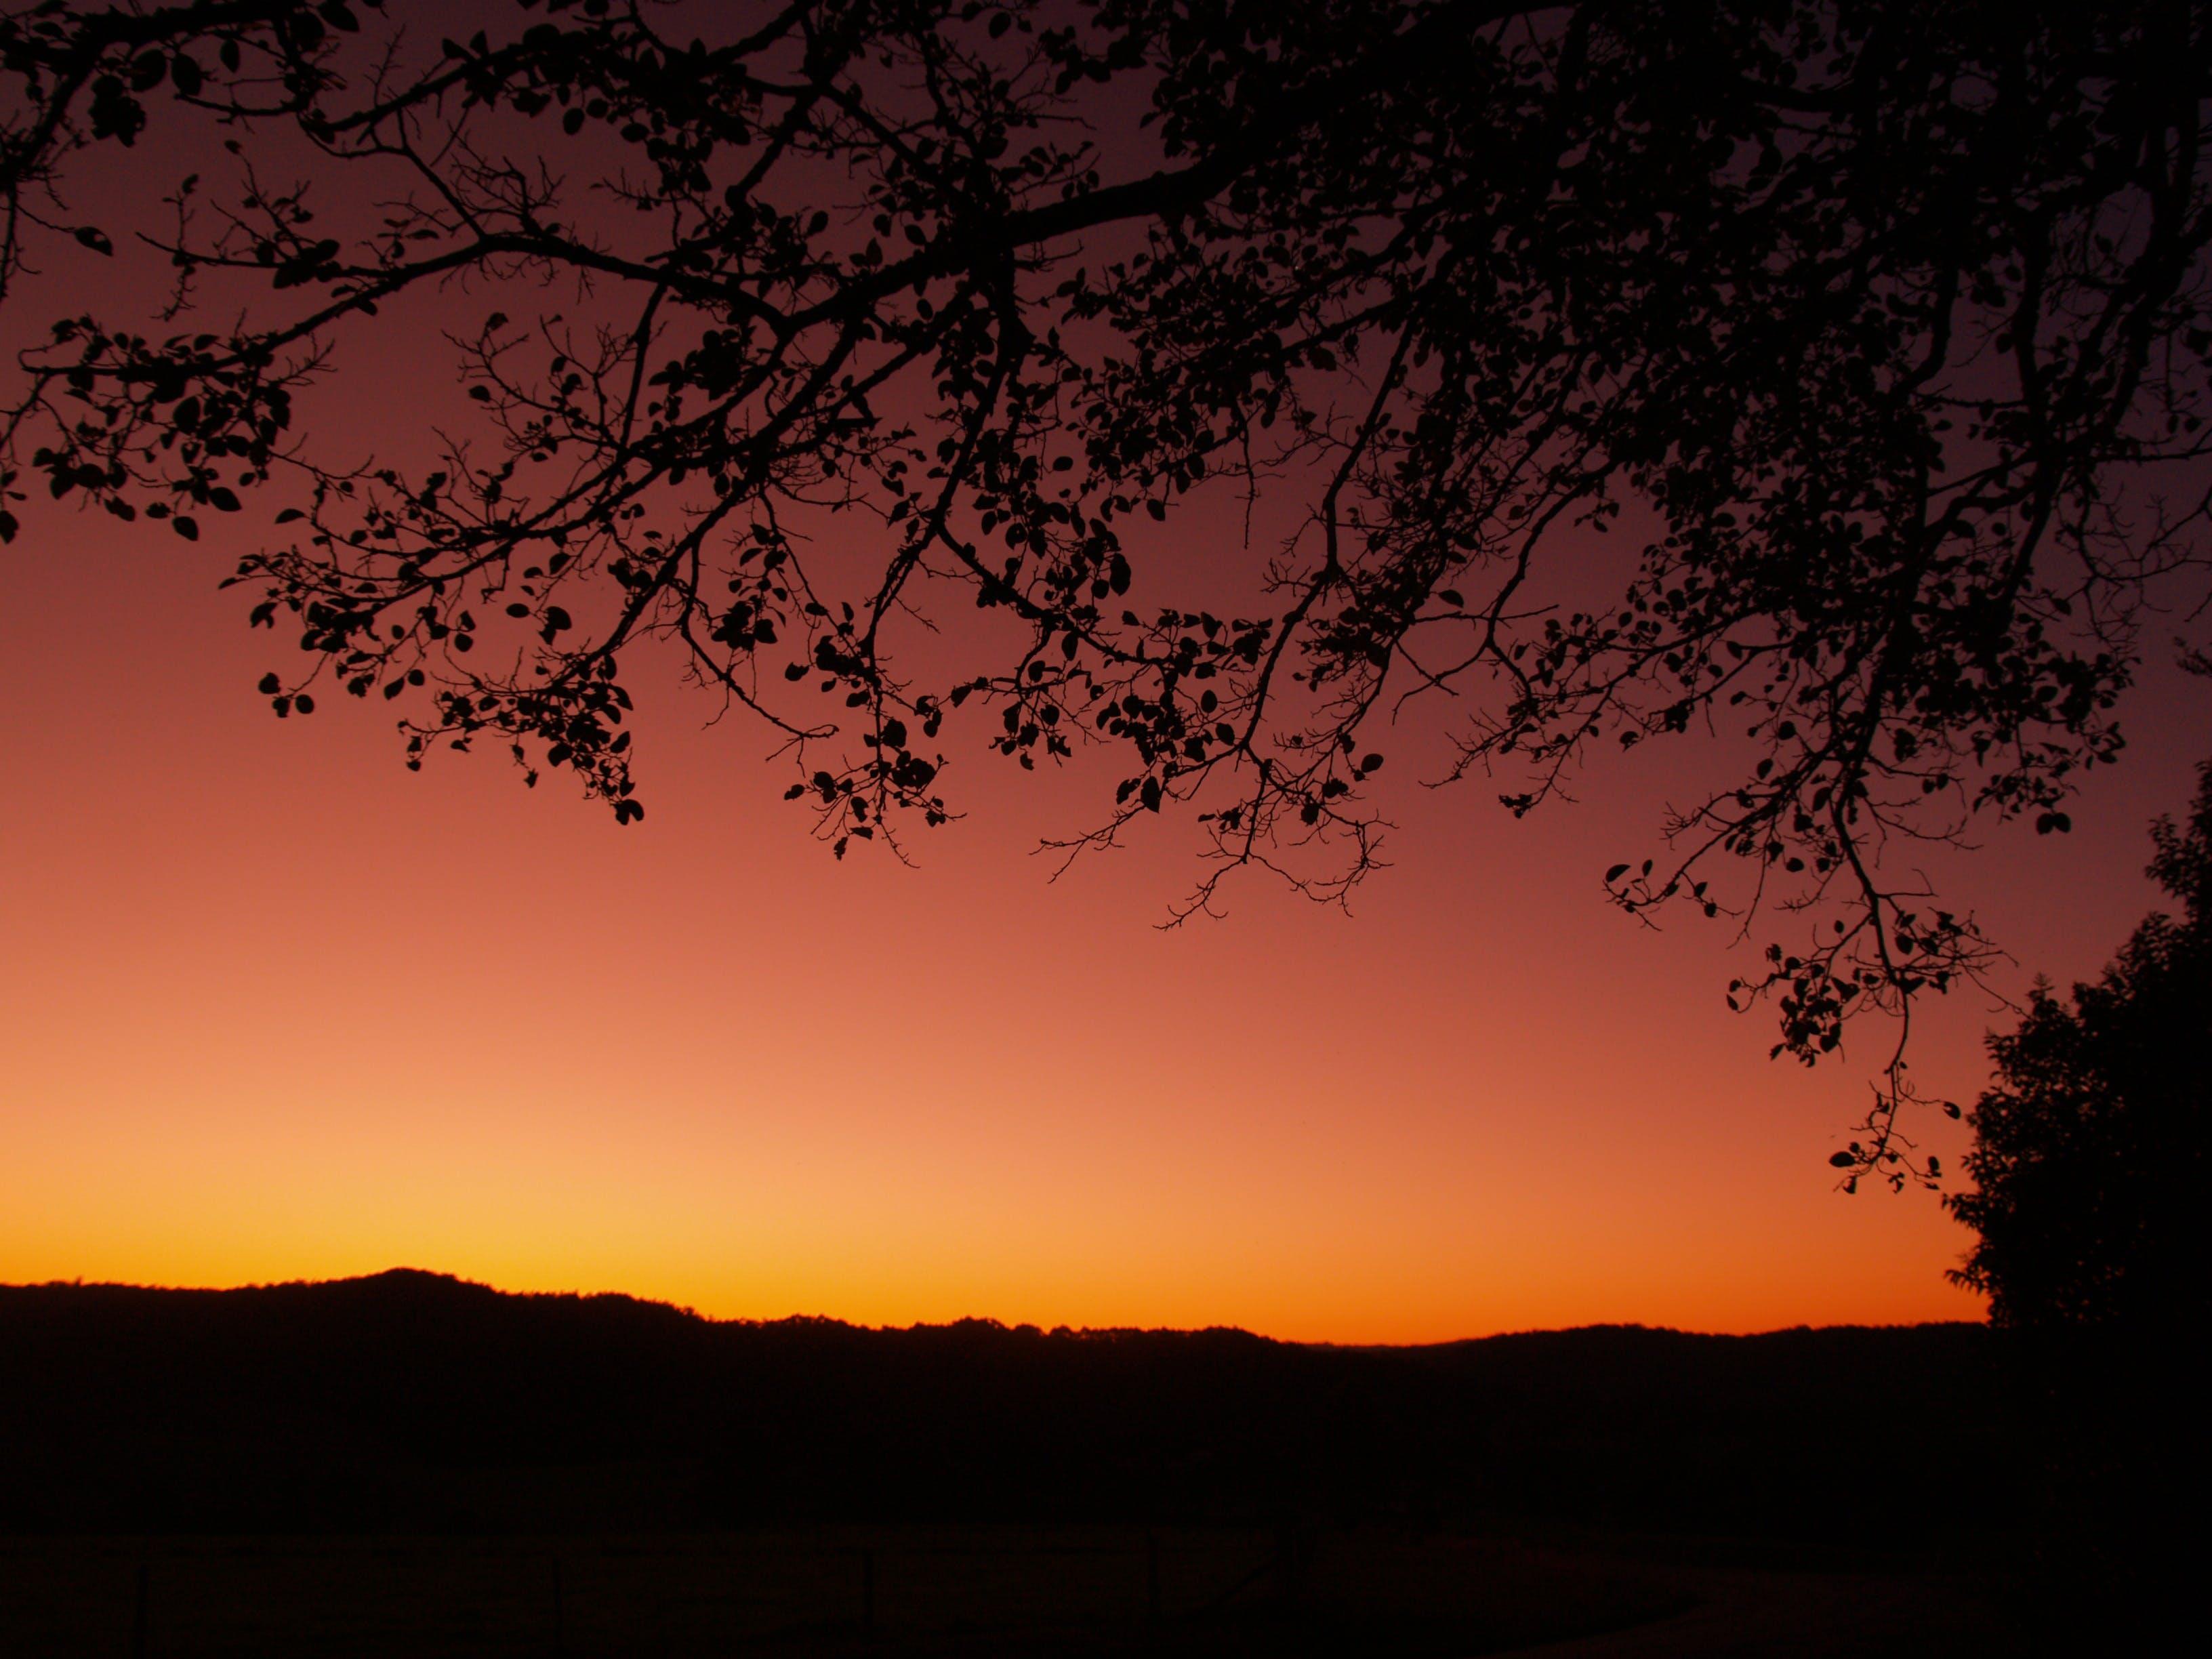 Free stock photo of mountains, sunset, skyline, silhouette